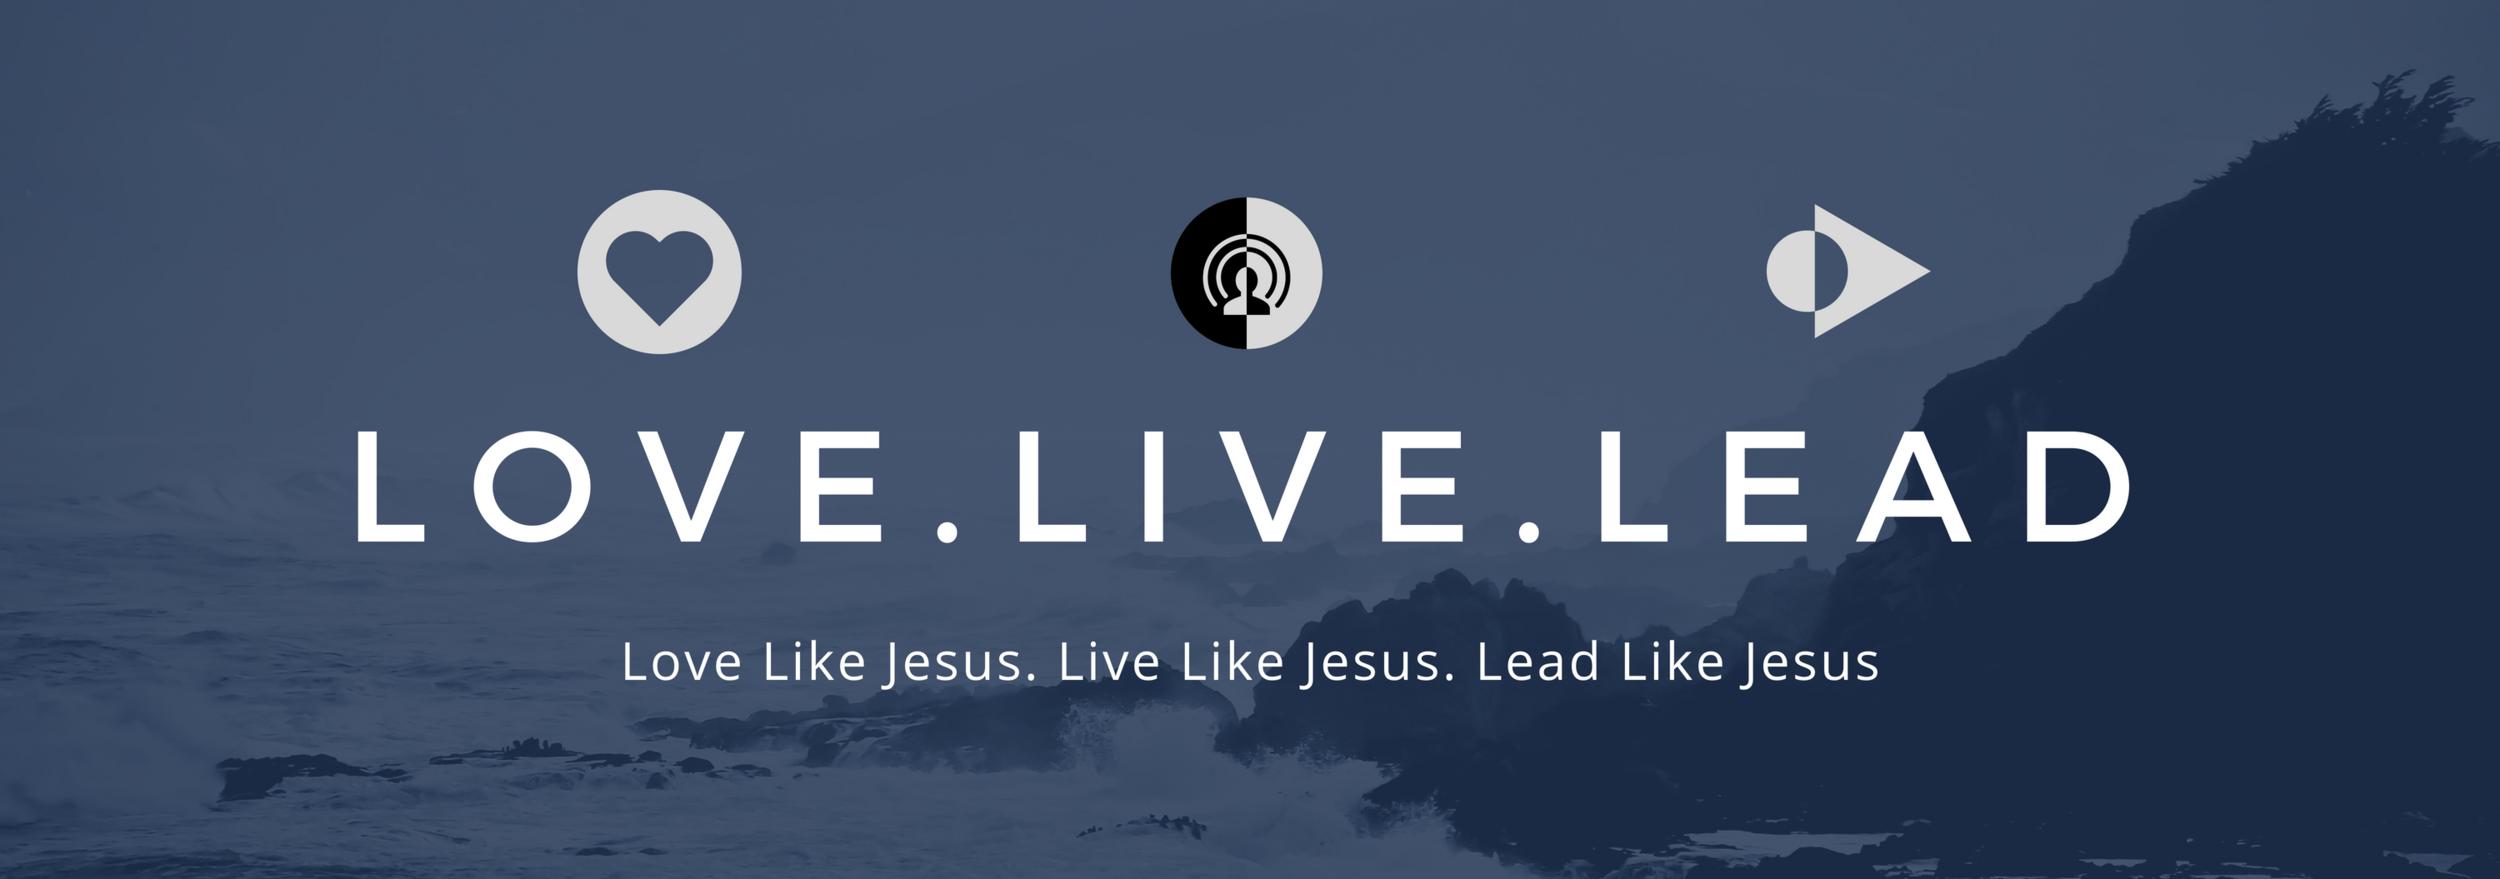 Love.live.Lead.png